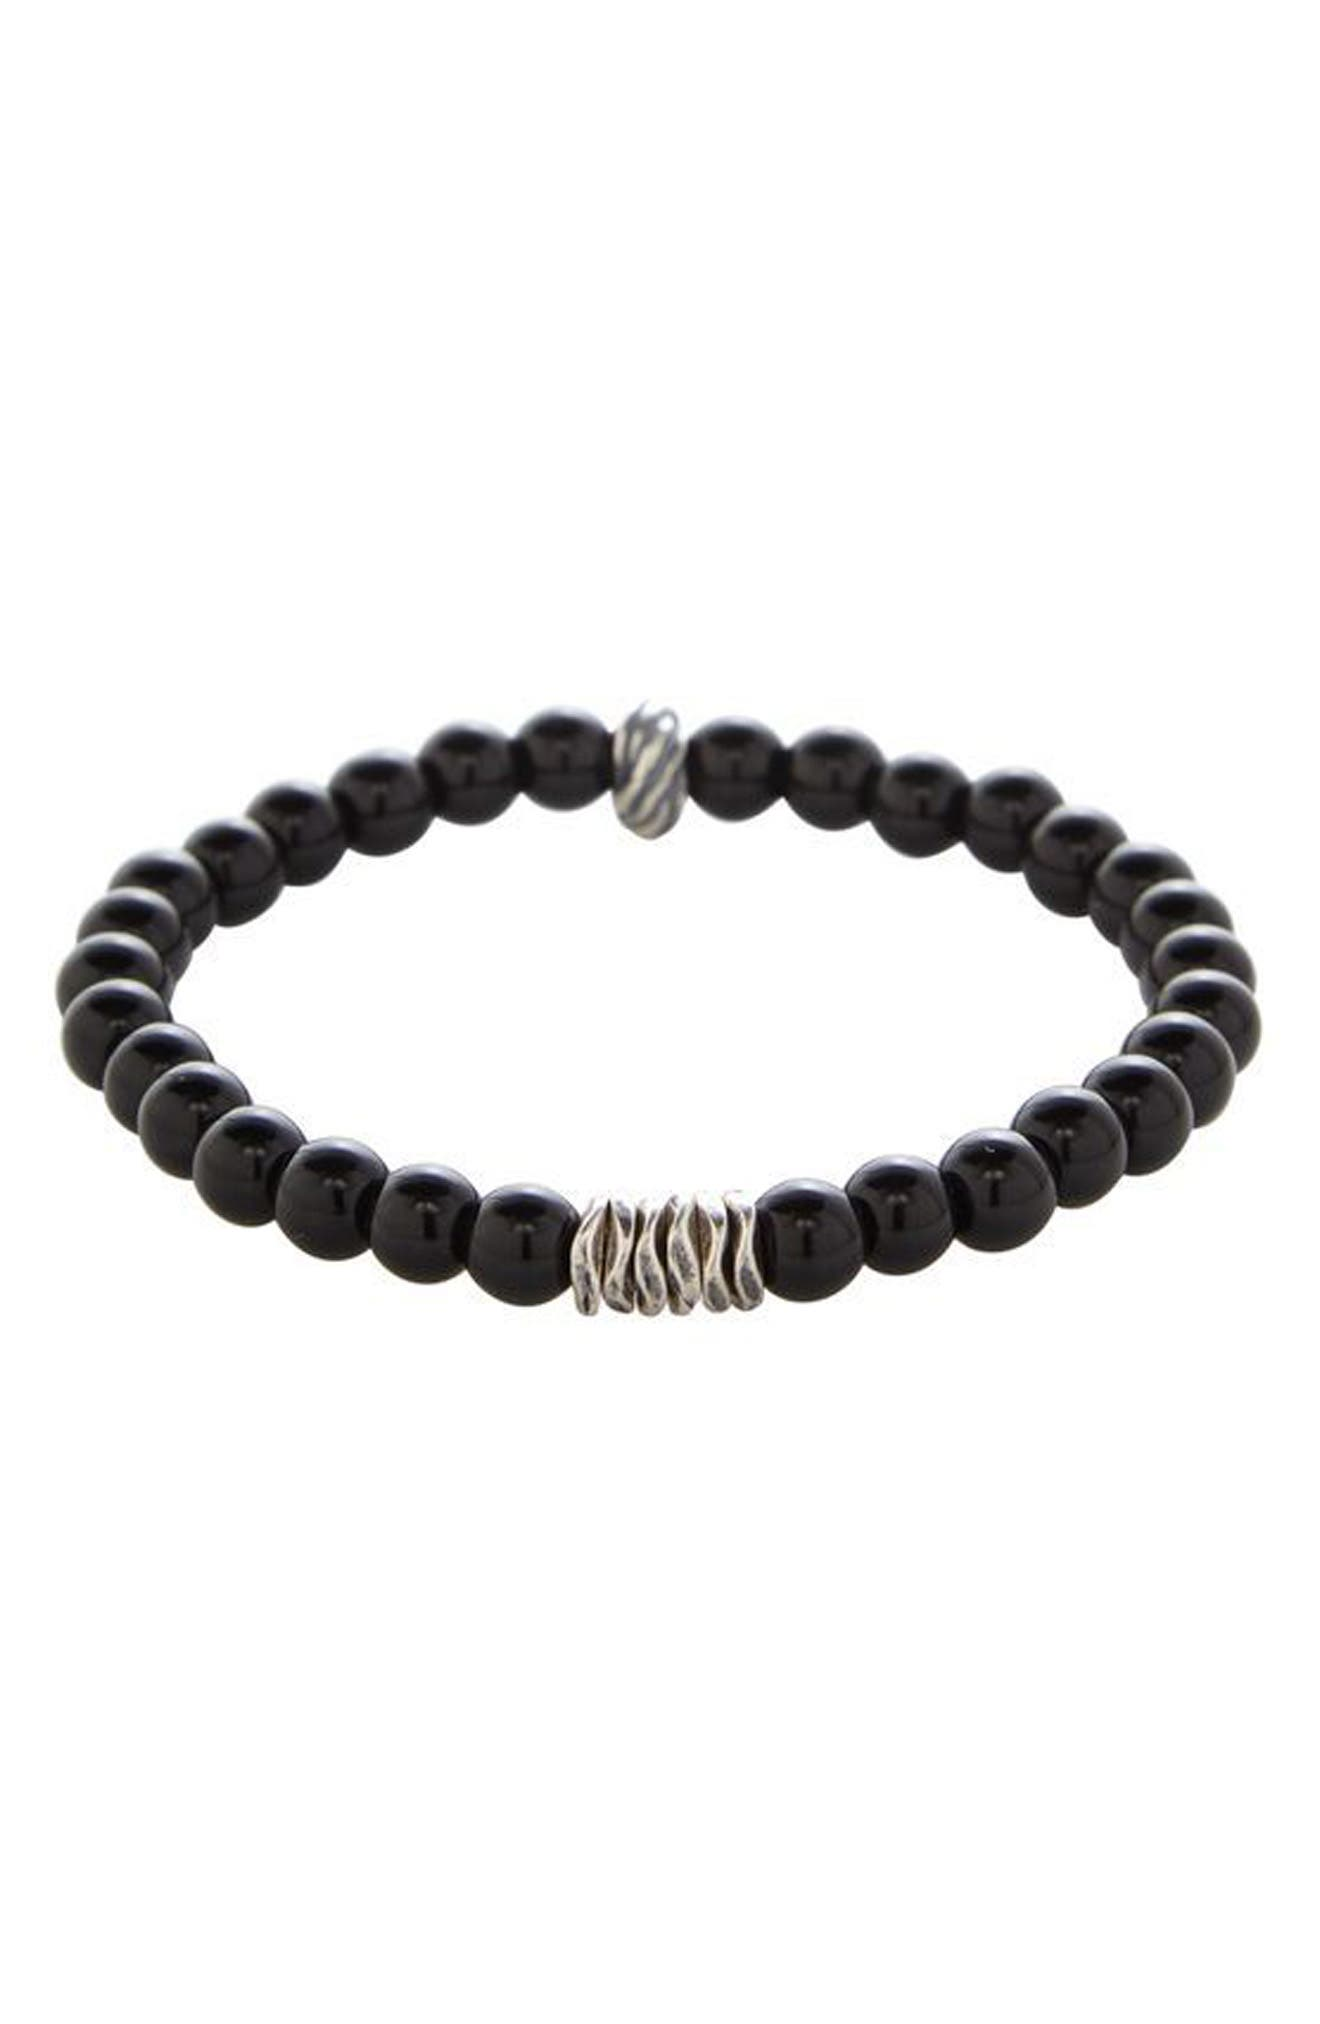 Main Image - Degs & Sal Onyx Bead Bracelet